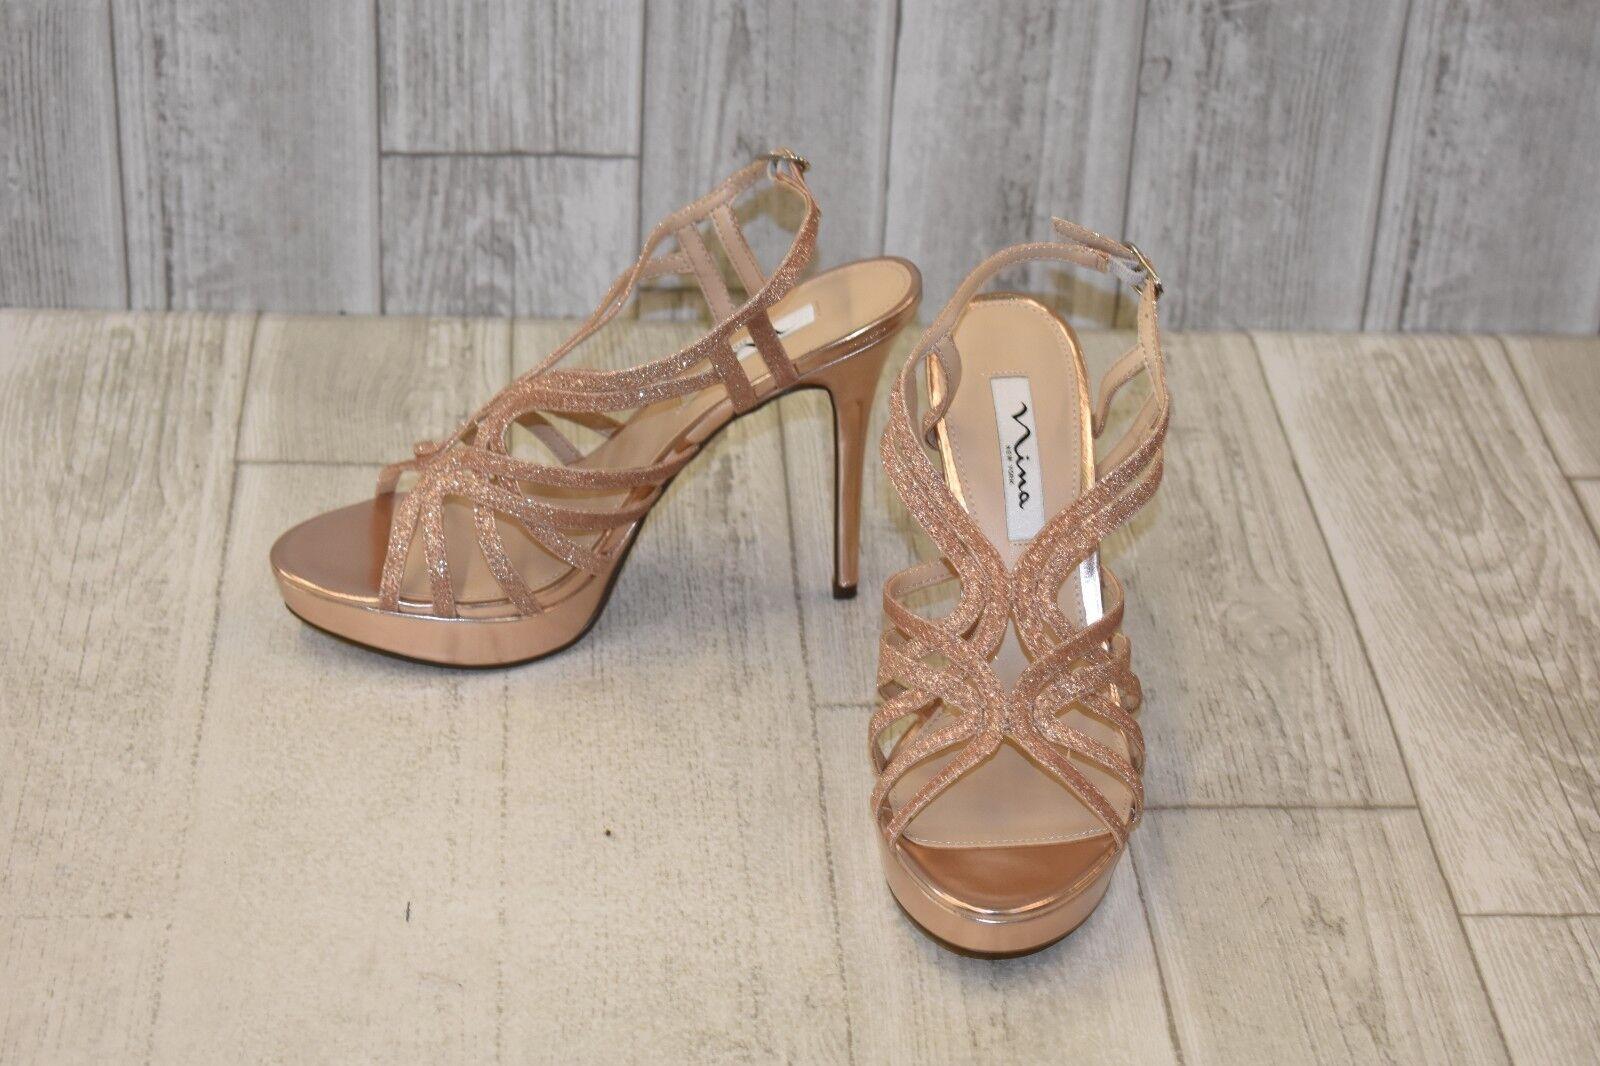 Nina Solina Platform Heel - Women's Size 9.5M pink gold